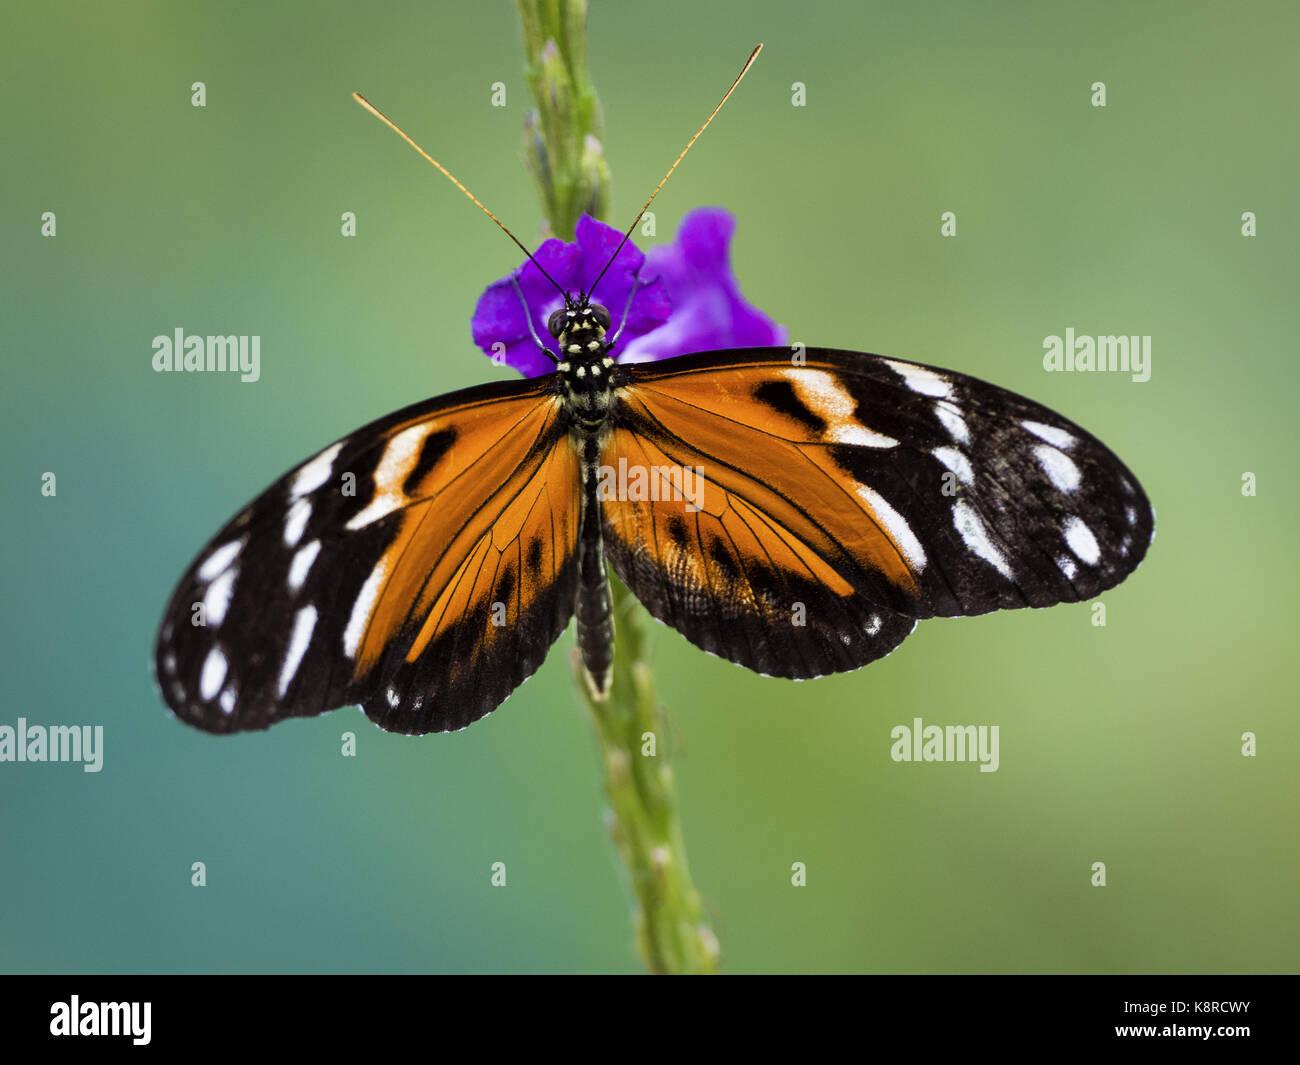 Heliconia spp. Schmetterling auf eisenkraut Blüte, Gamboa, Panama, Februar Stockbild